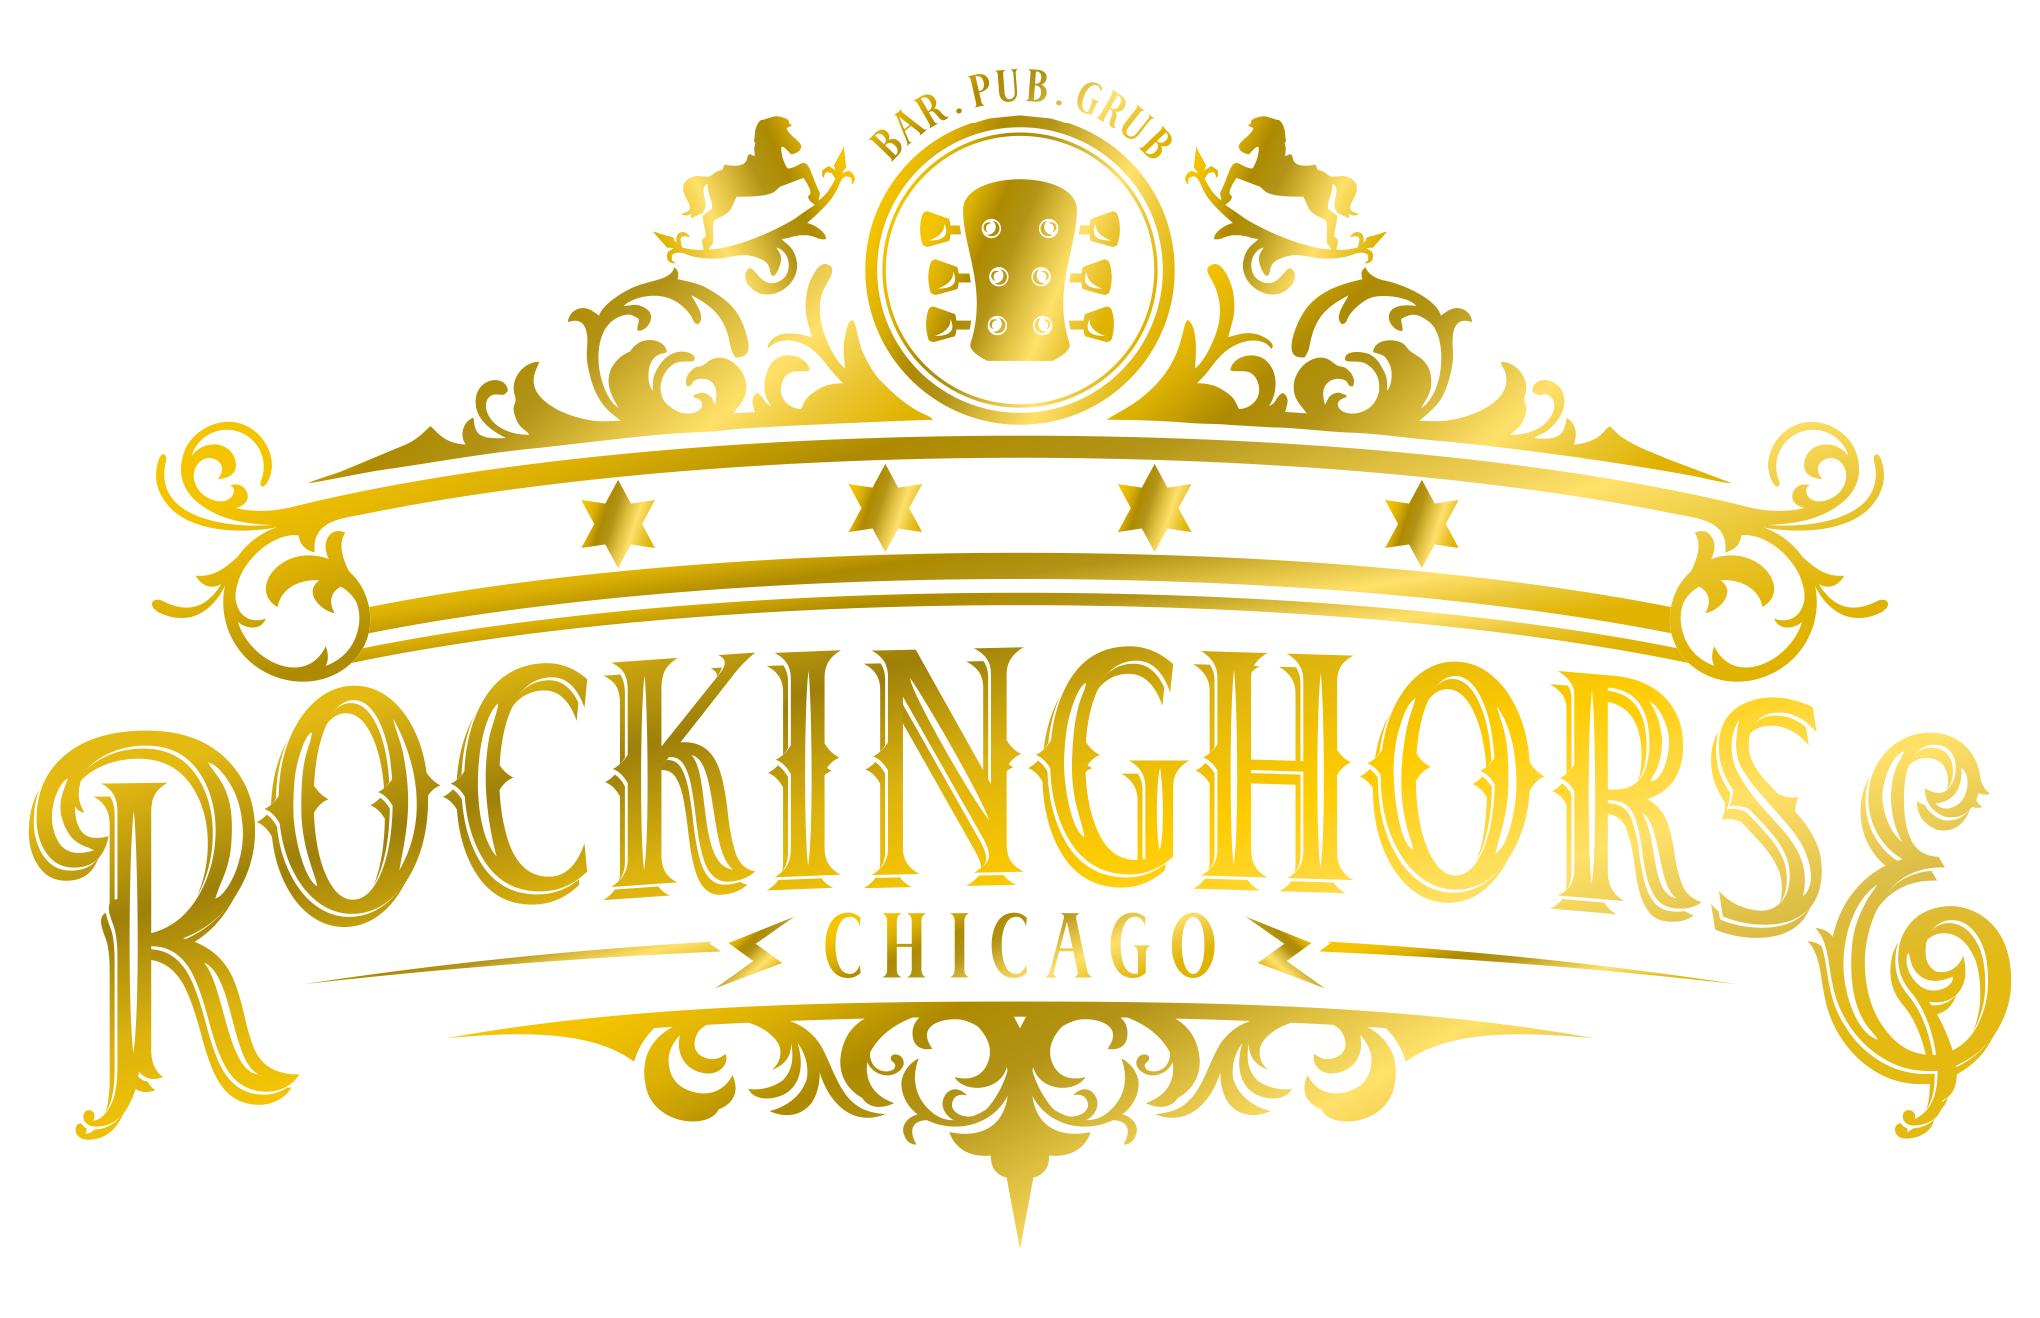 Rockinghorse Chicago !!